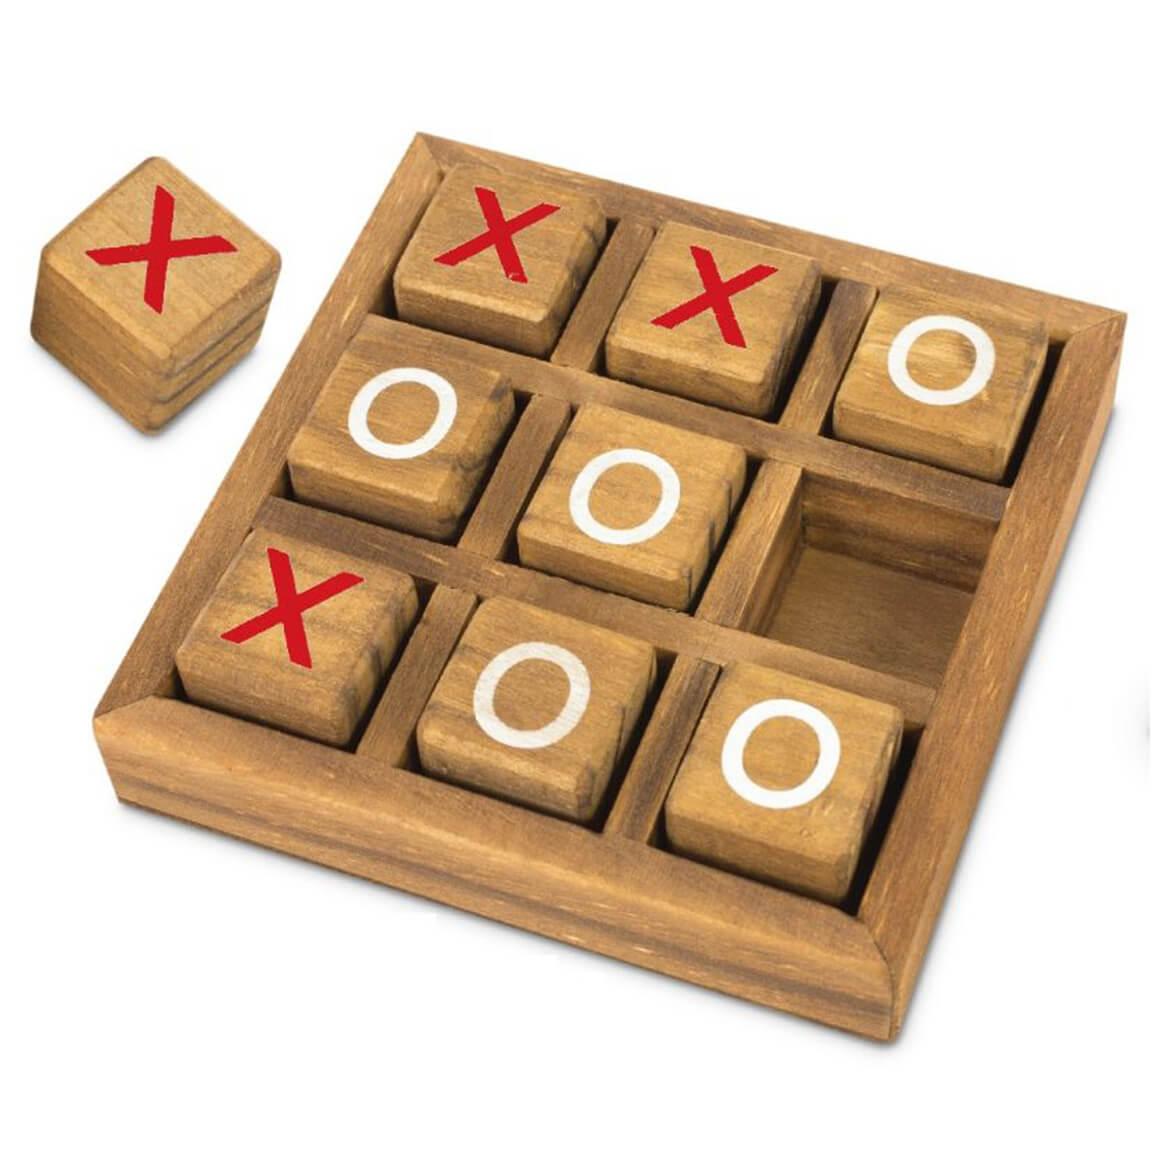 Wooden Tic Tac Toe 10 Pc Set Wood Games Miles Kimball